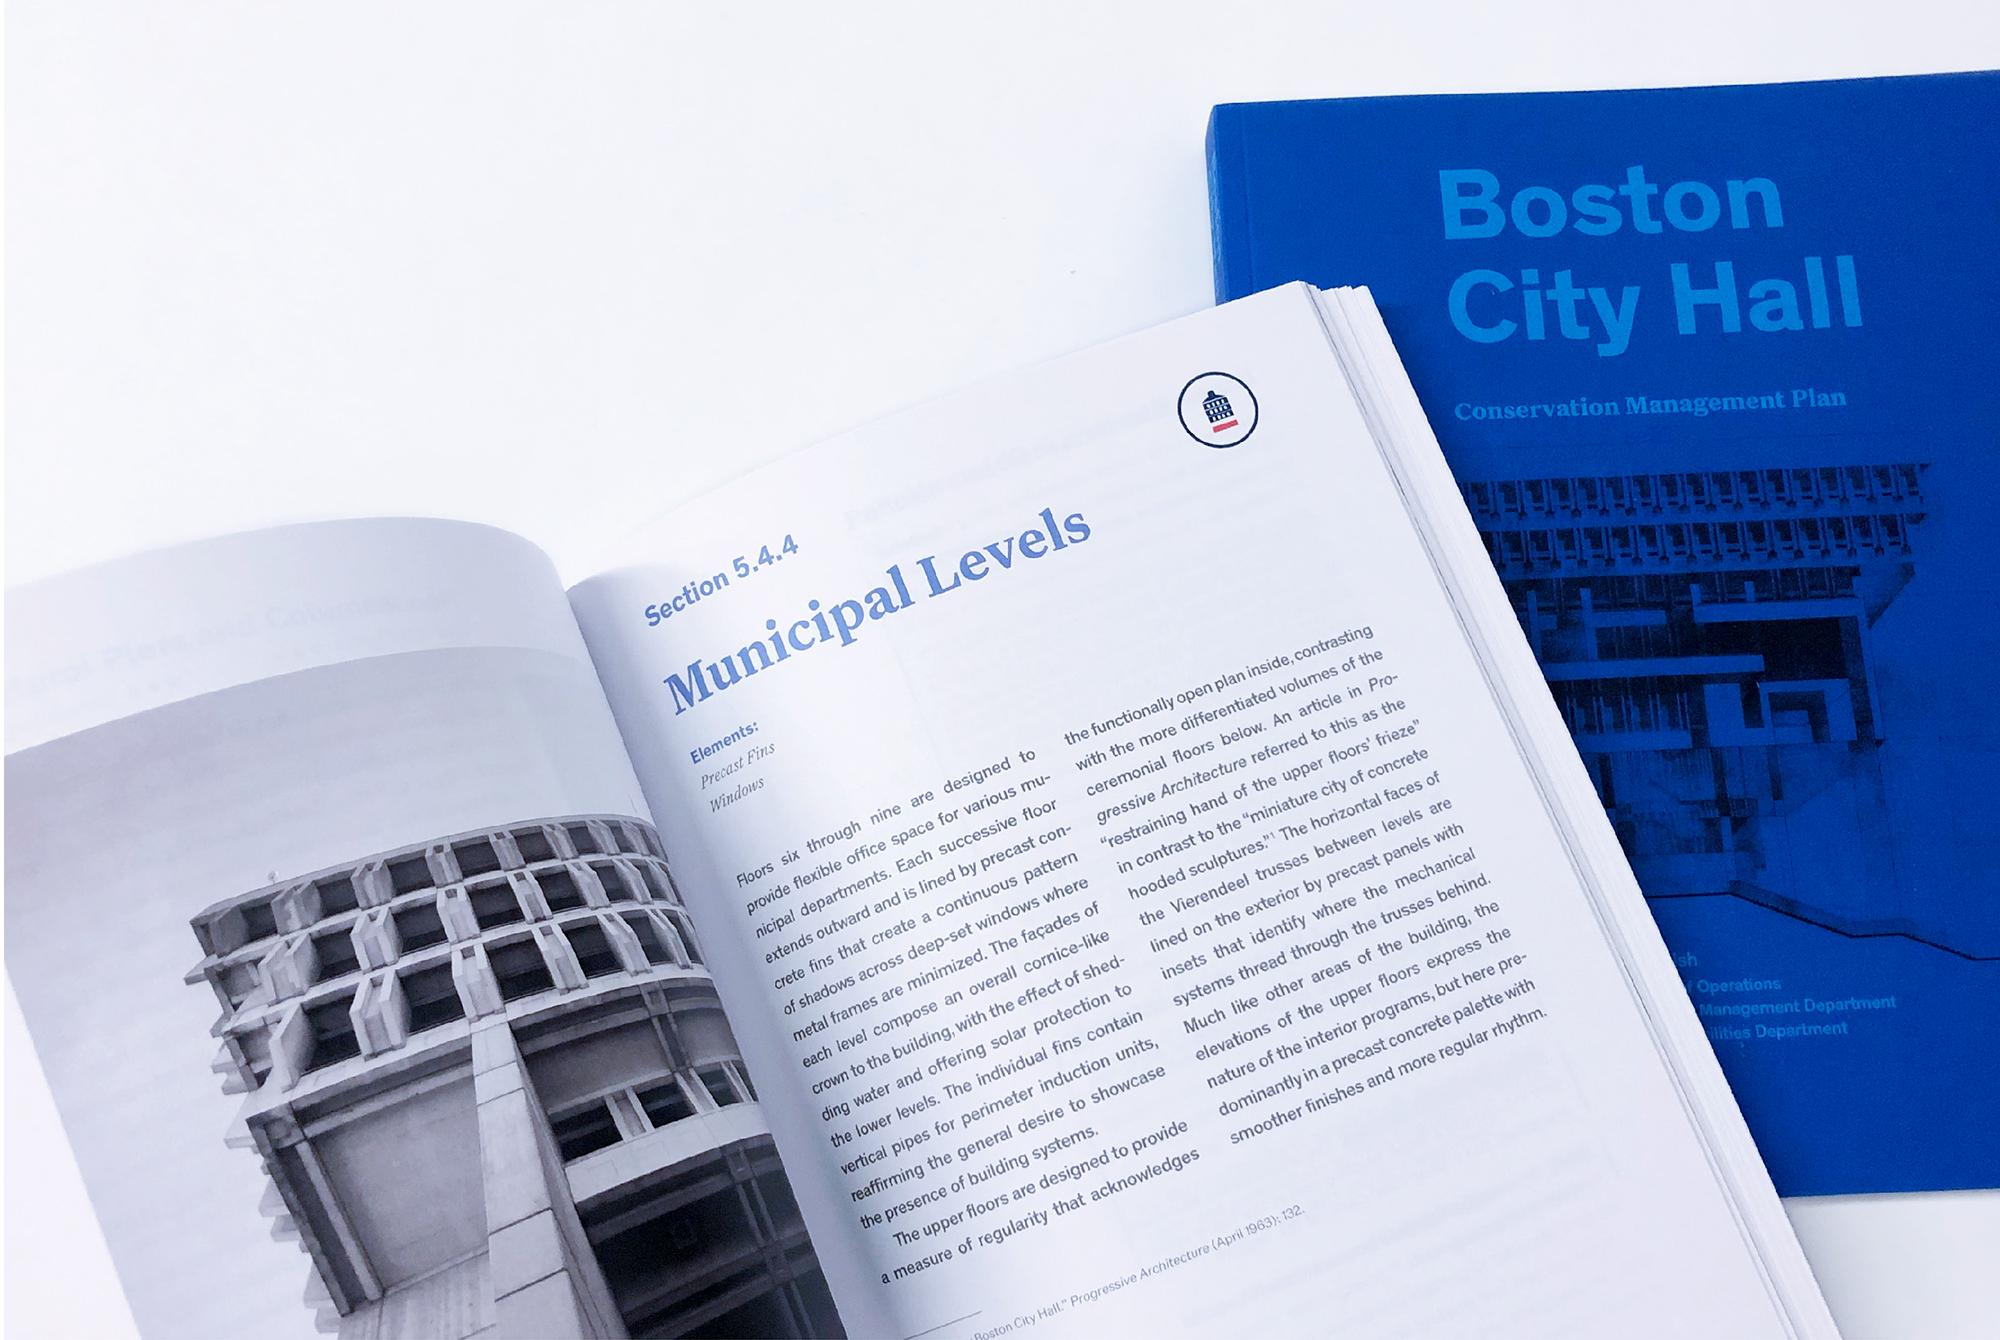 Boston City Hall Conservation Management Plan wins Docomomo US 2021 Modernism in America Award